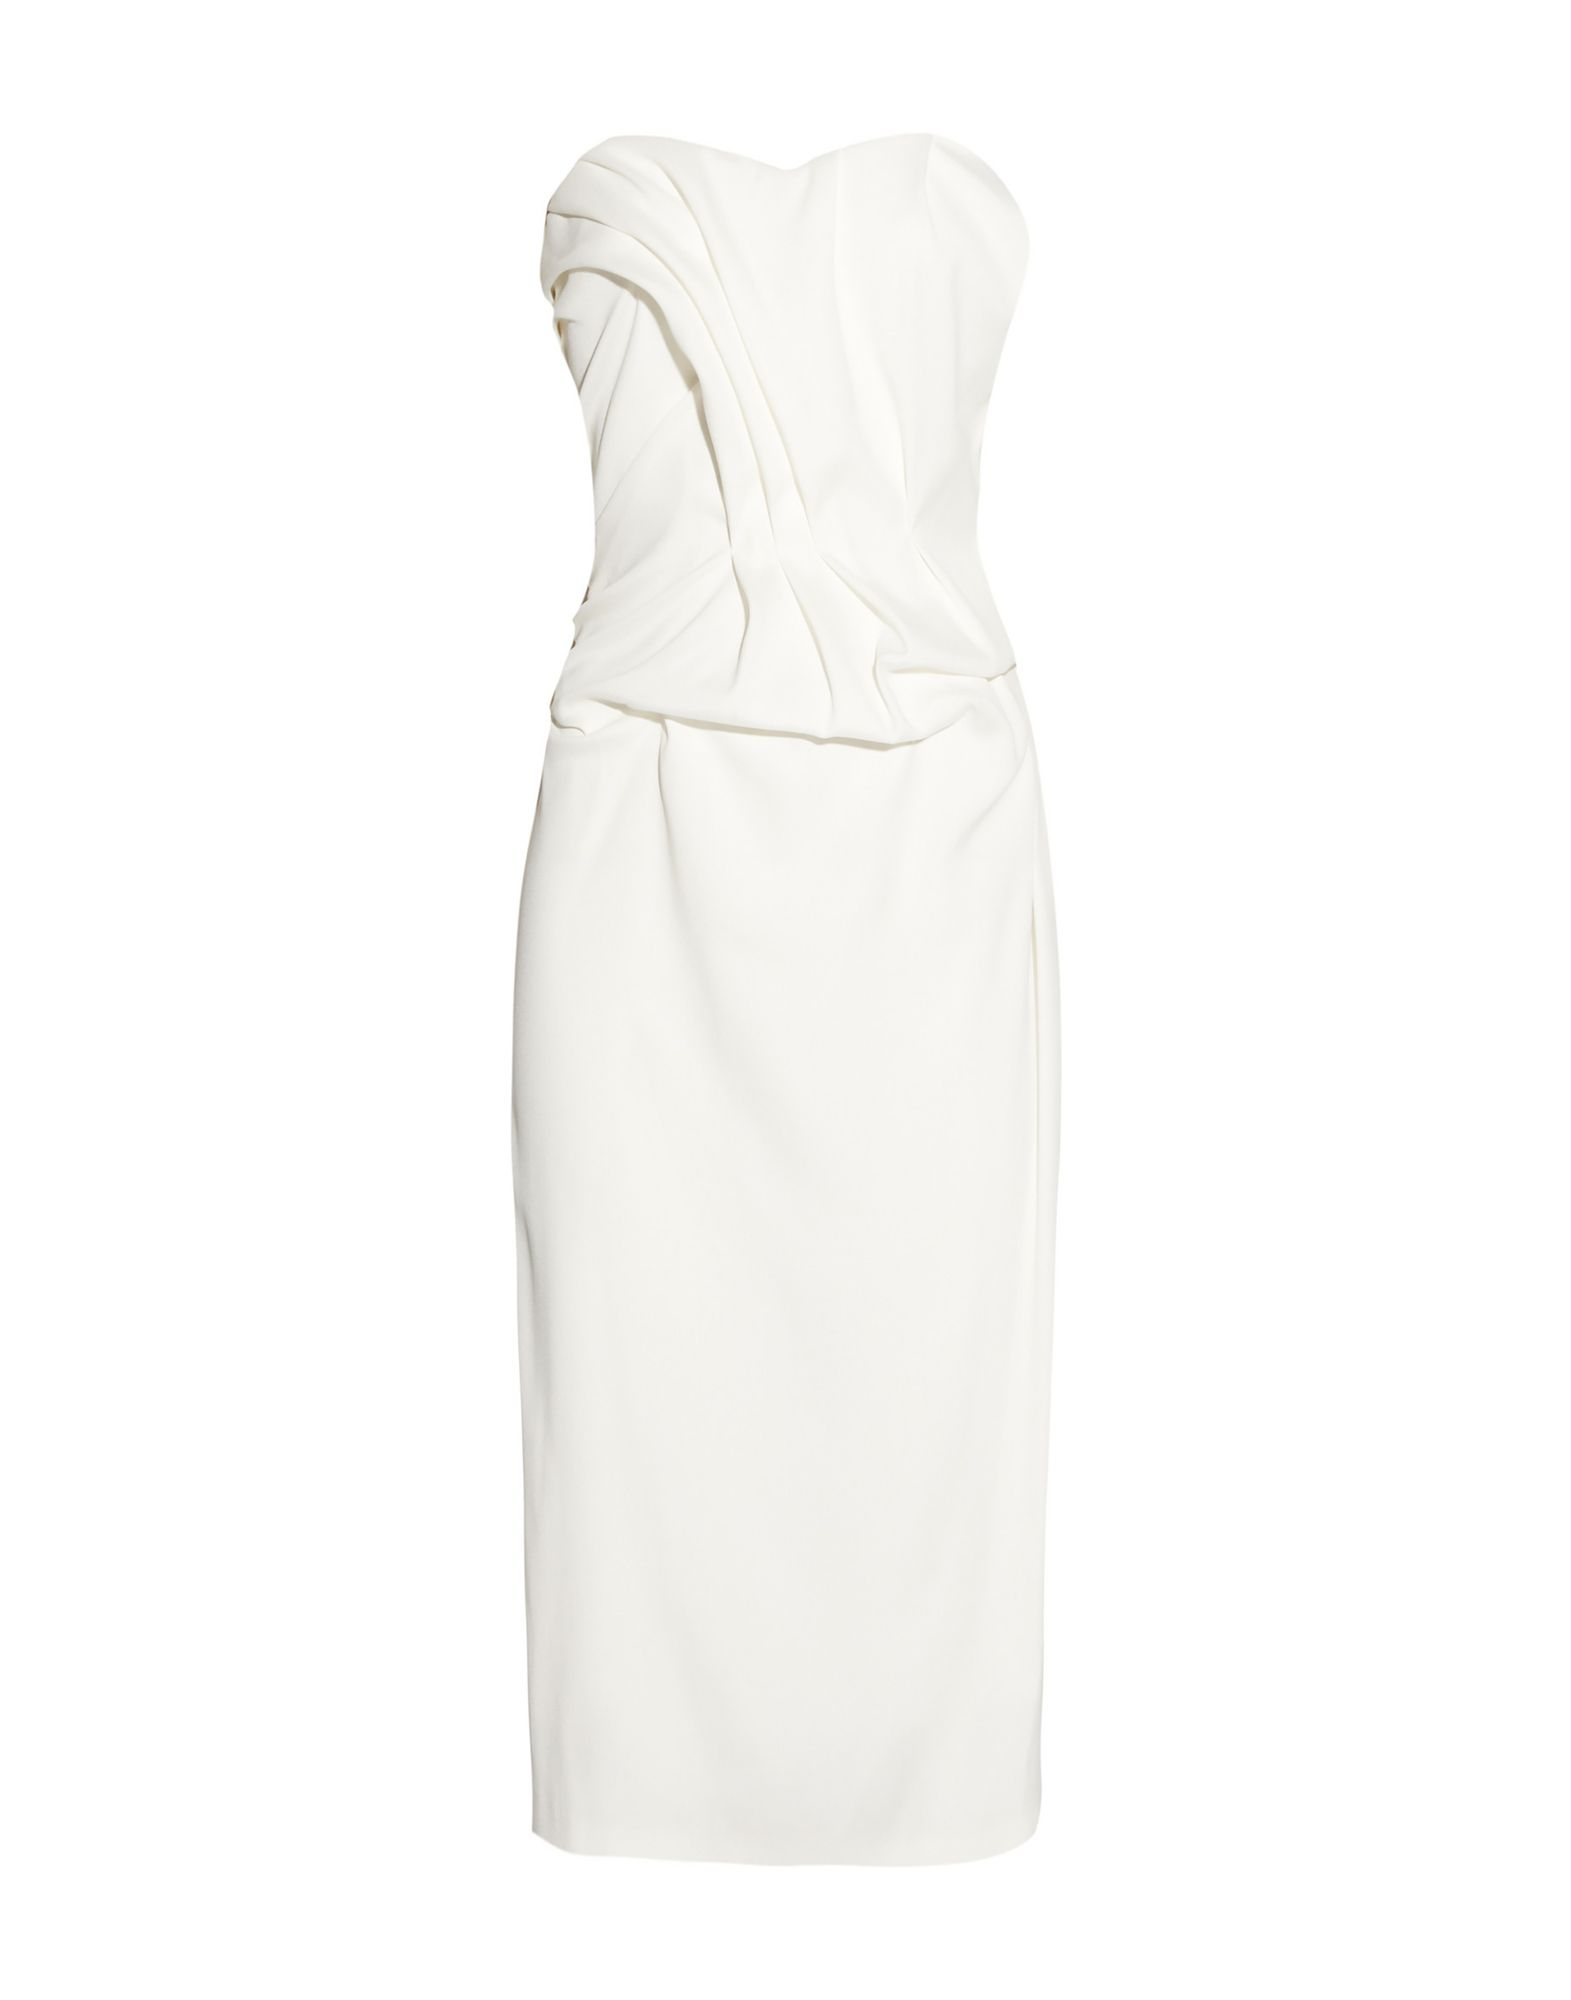 SOPHIA KOKOSALAKI Платье до колена цена 2017